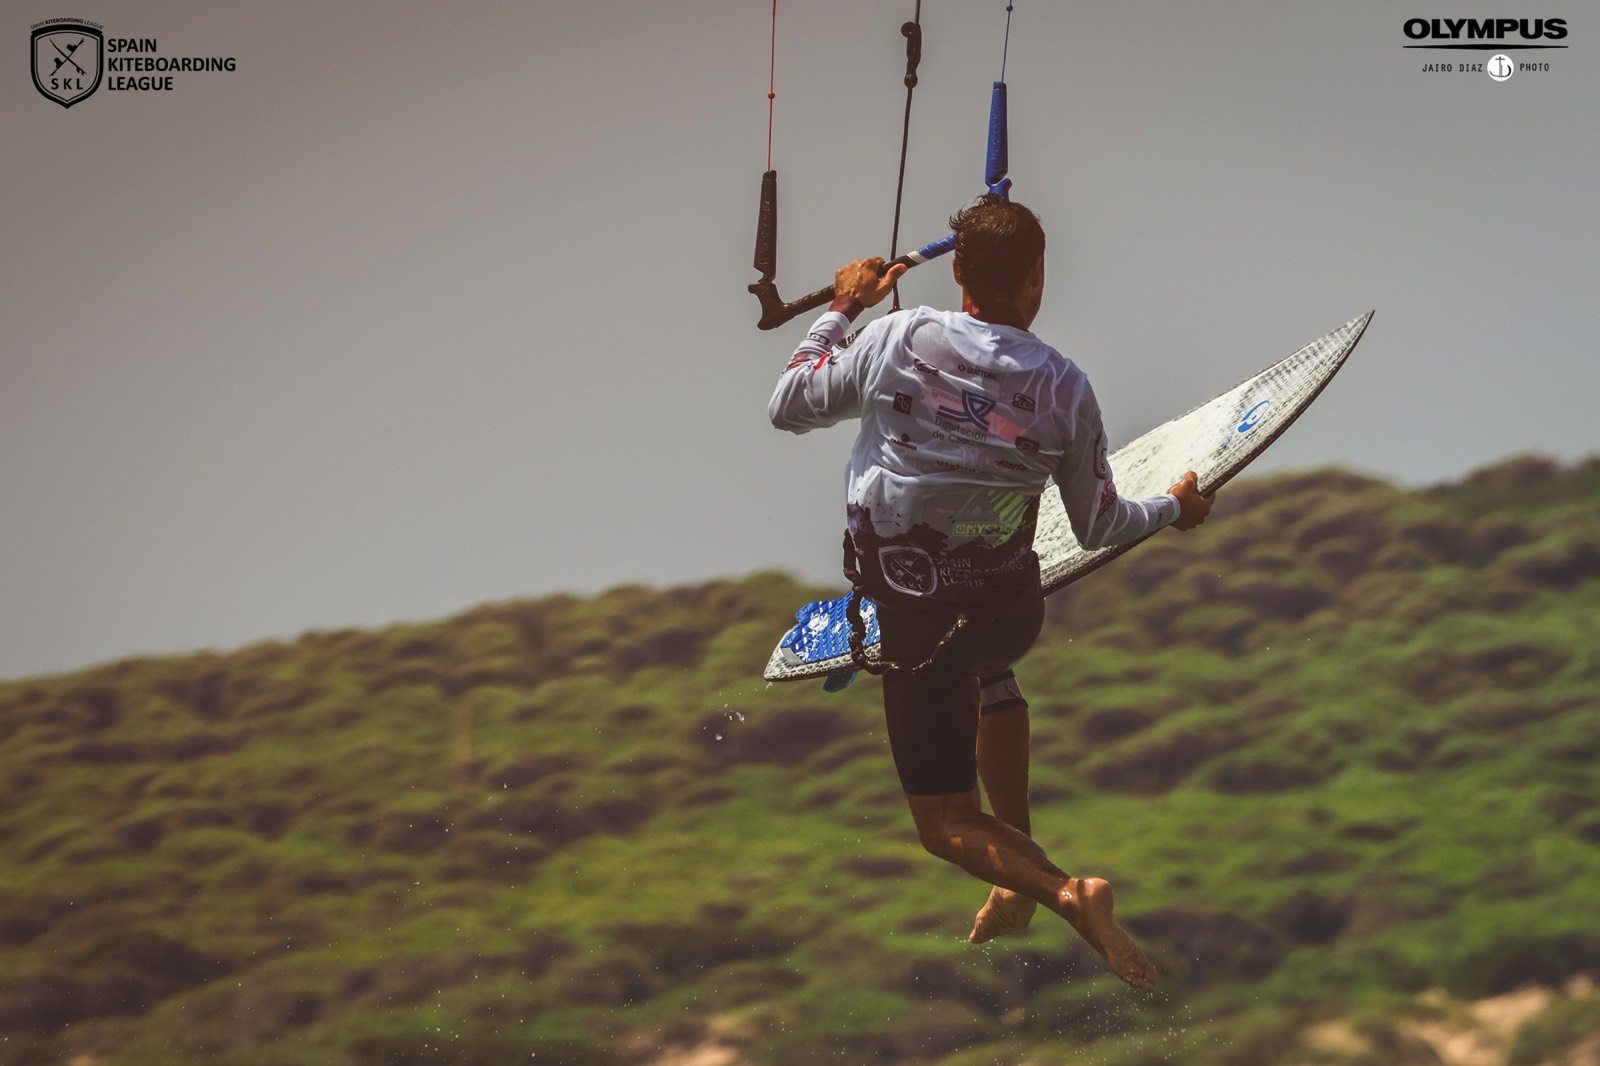 galeria-spain-kiteboarding-league-2018-11